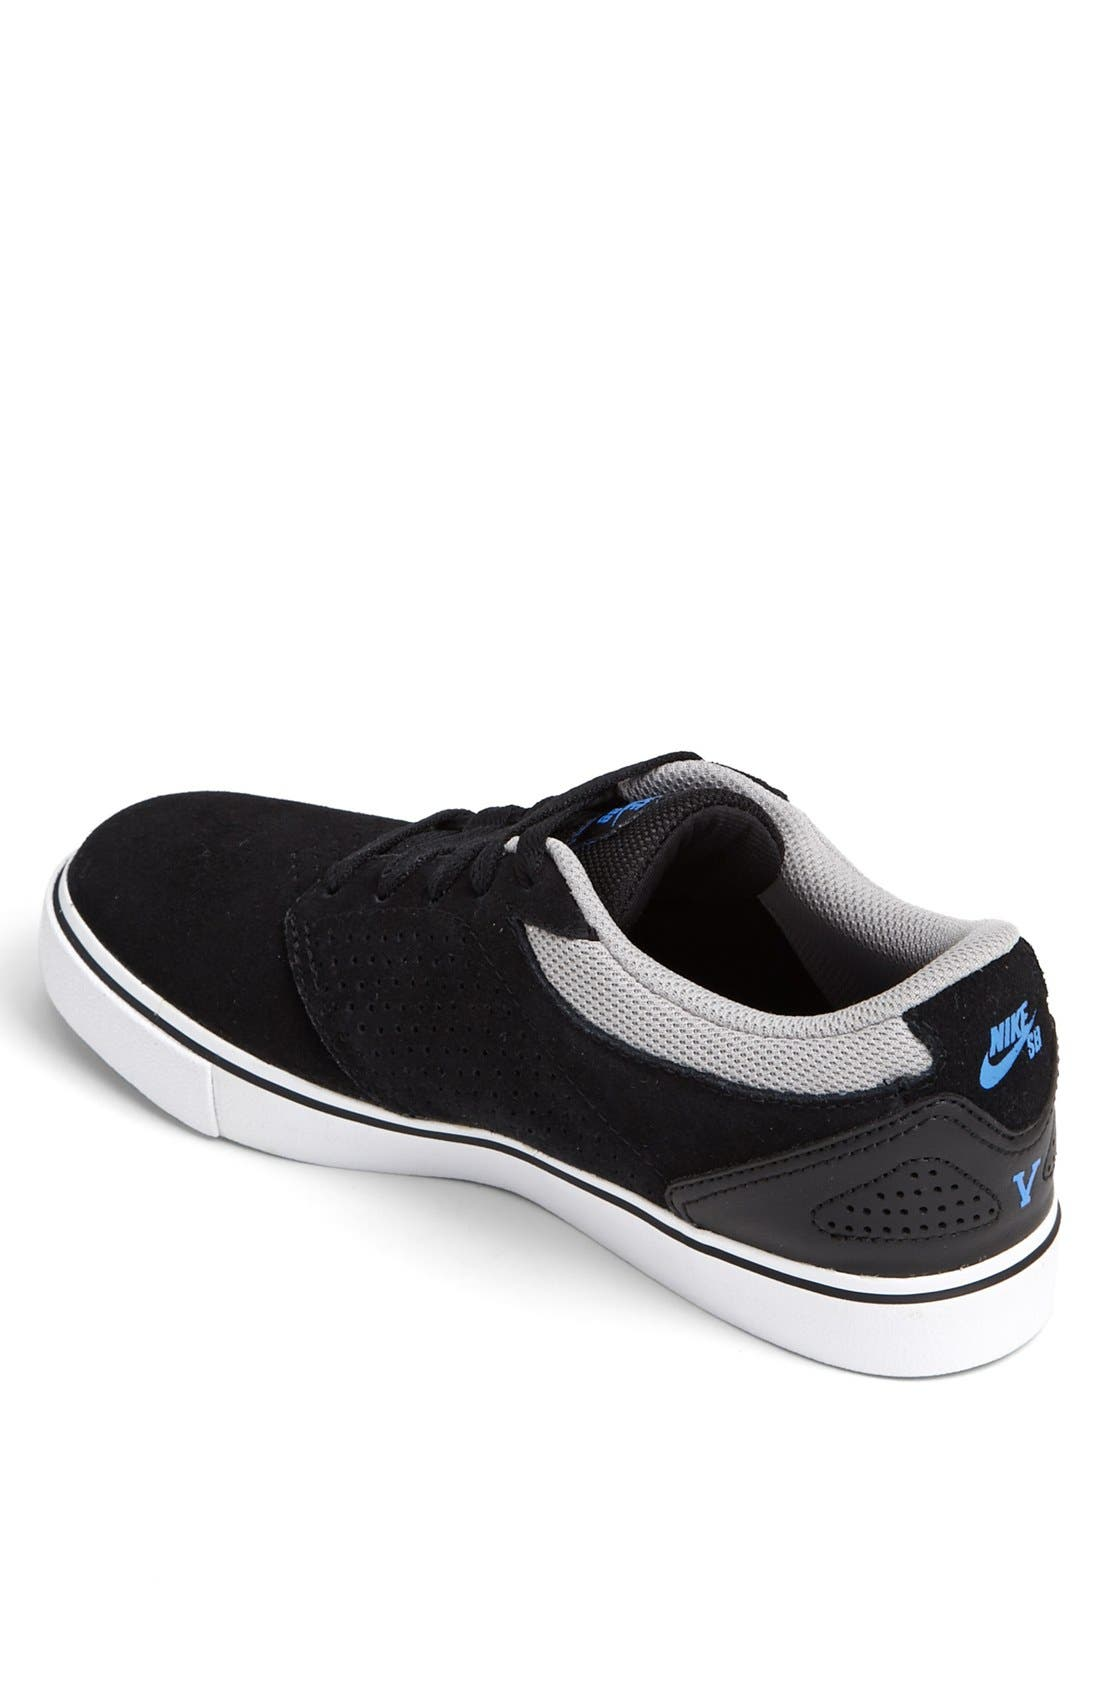 Alternate Image 2  - Nike 'Paul Rodriguez 5 LR' Sneaker (Men)